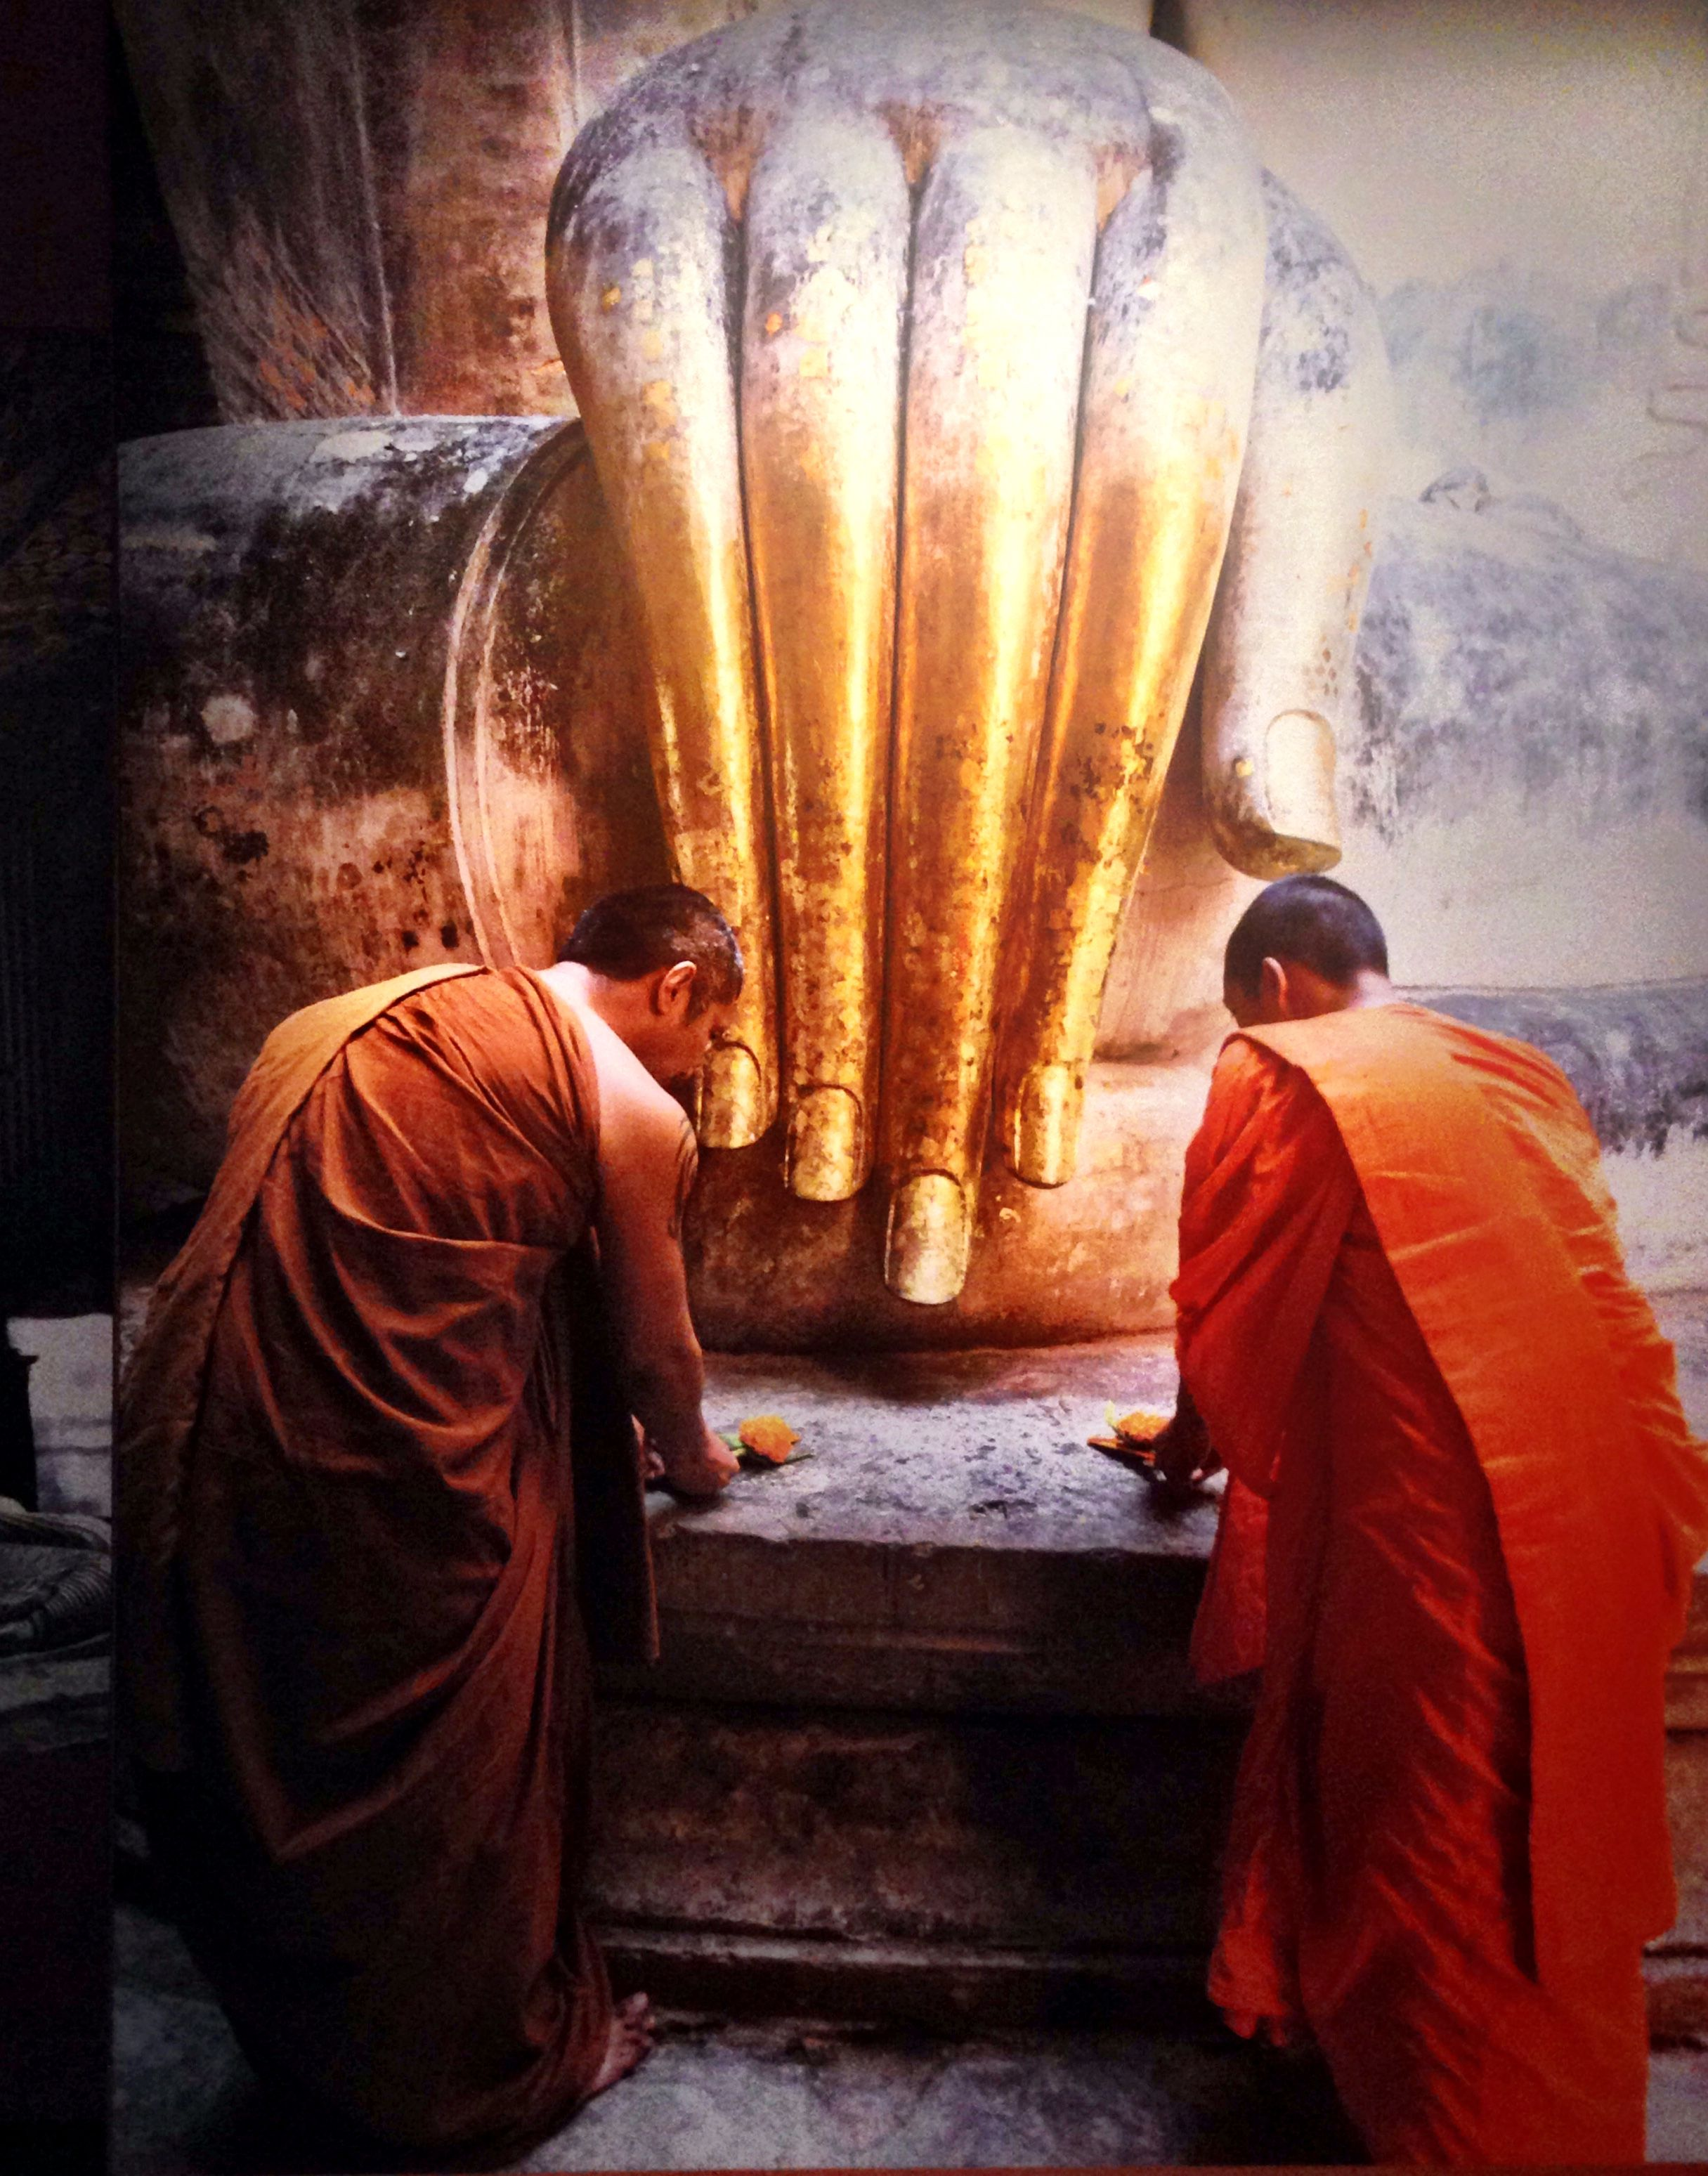 Boeddha expositie @tropenmuseum